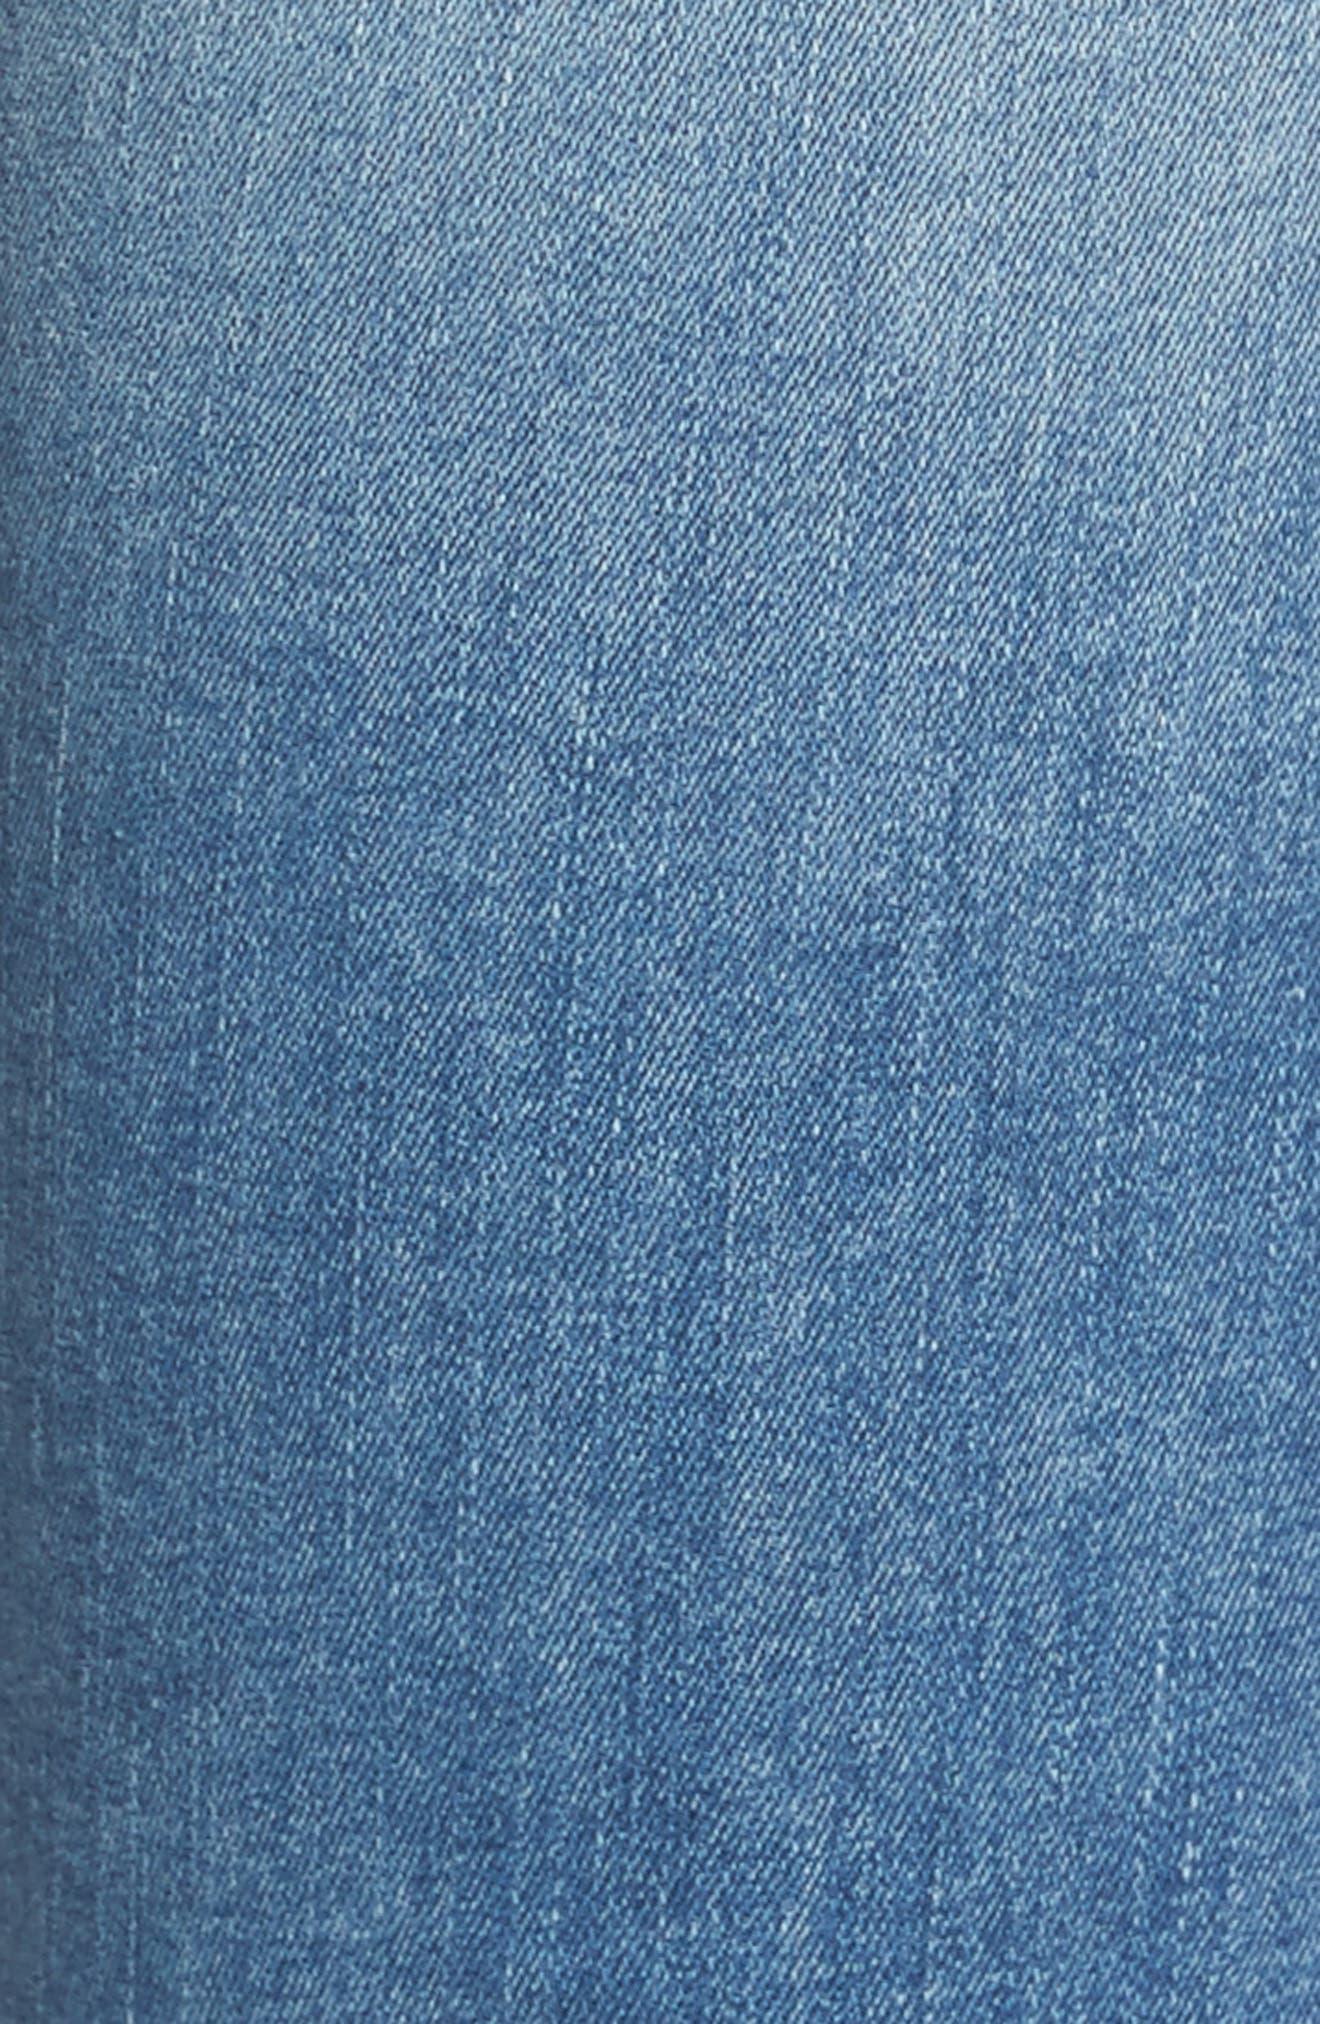 Florence Instasculpt Skinny Jeans,                             Alternate thumbnail 5, color,                             430